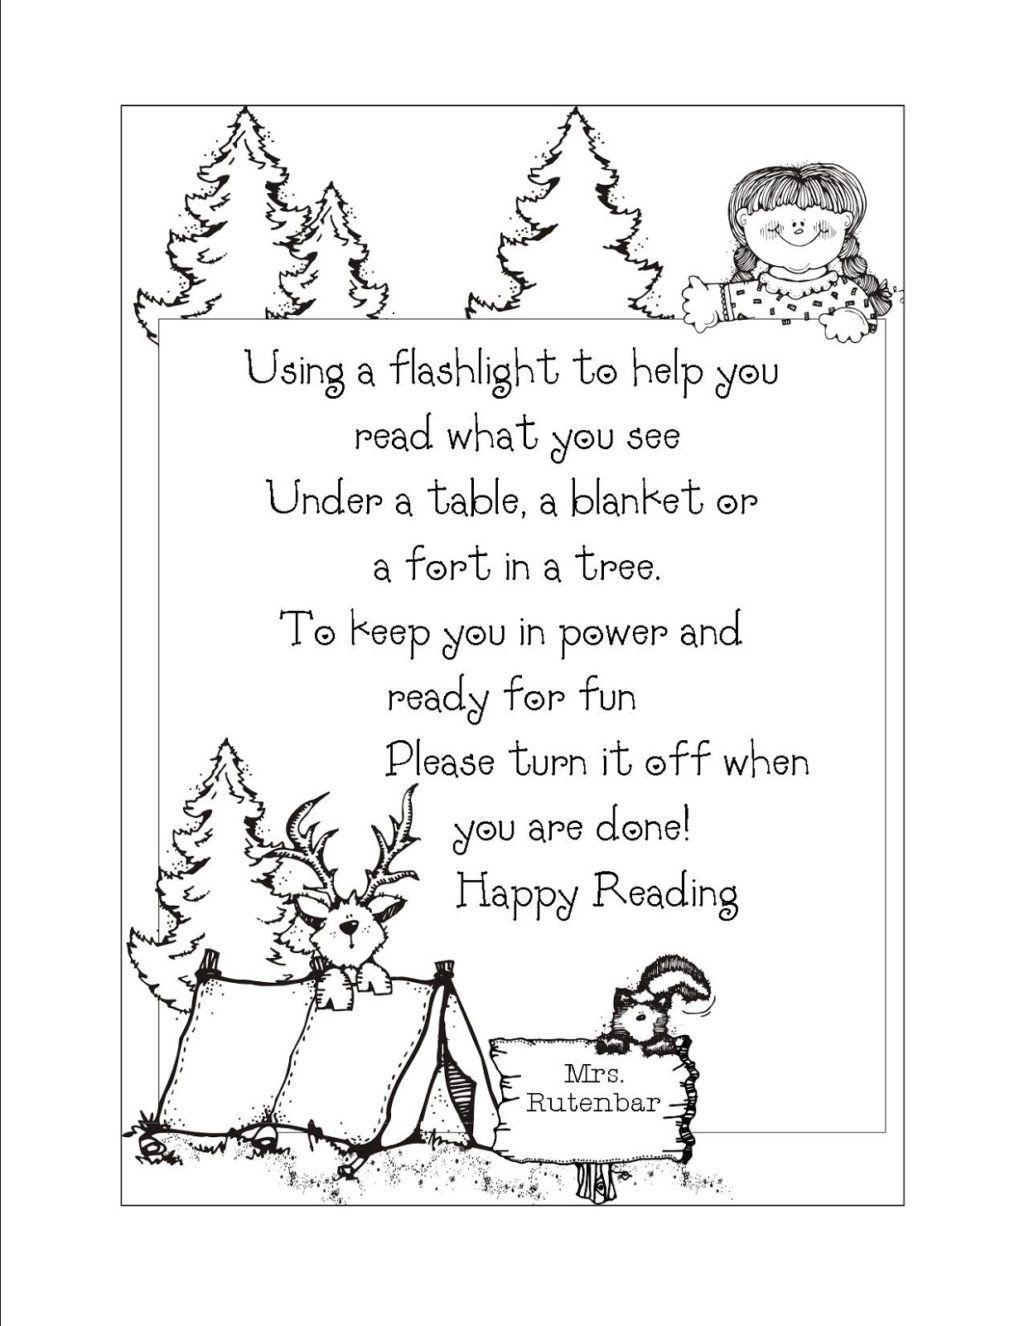 Holiday Math Worksheets 4th Grade Worksheet Christmas Math Worksheets 4th  Grade Writing   Holiday math worksheets [ 1326 x 1024 Pixel ]